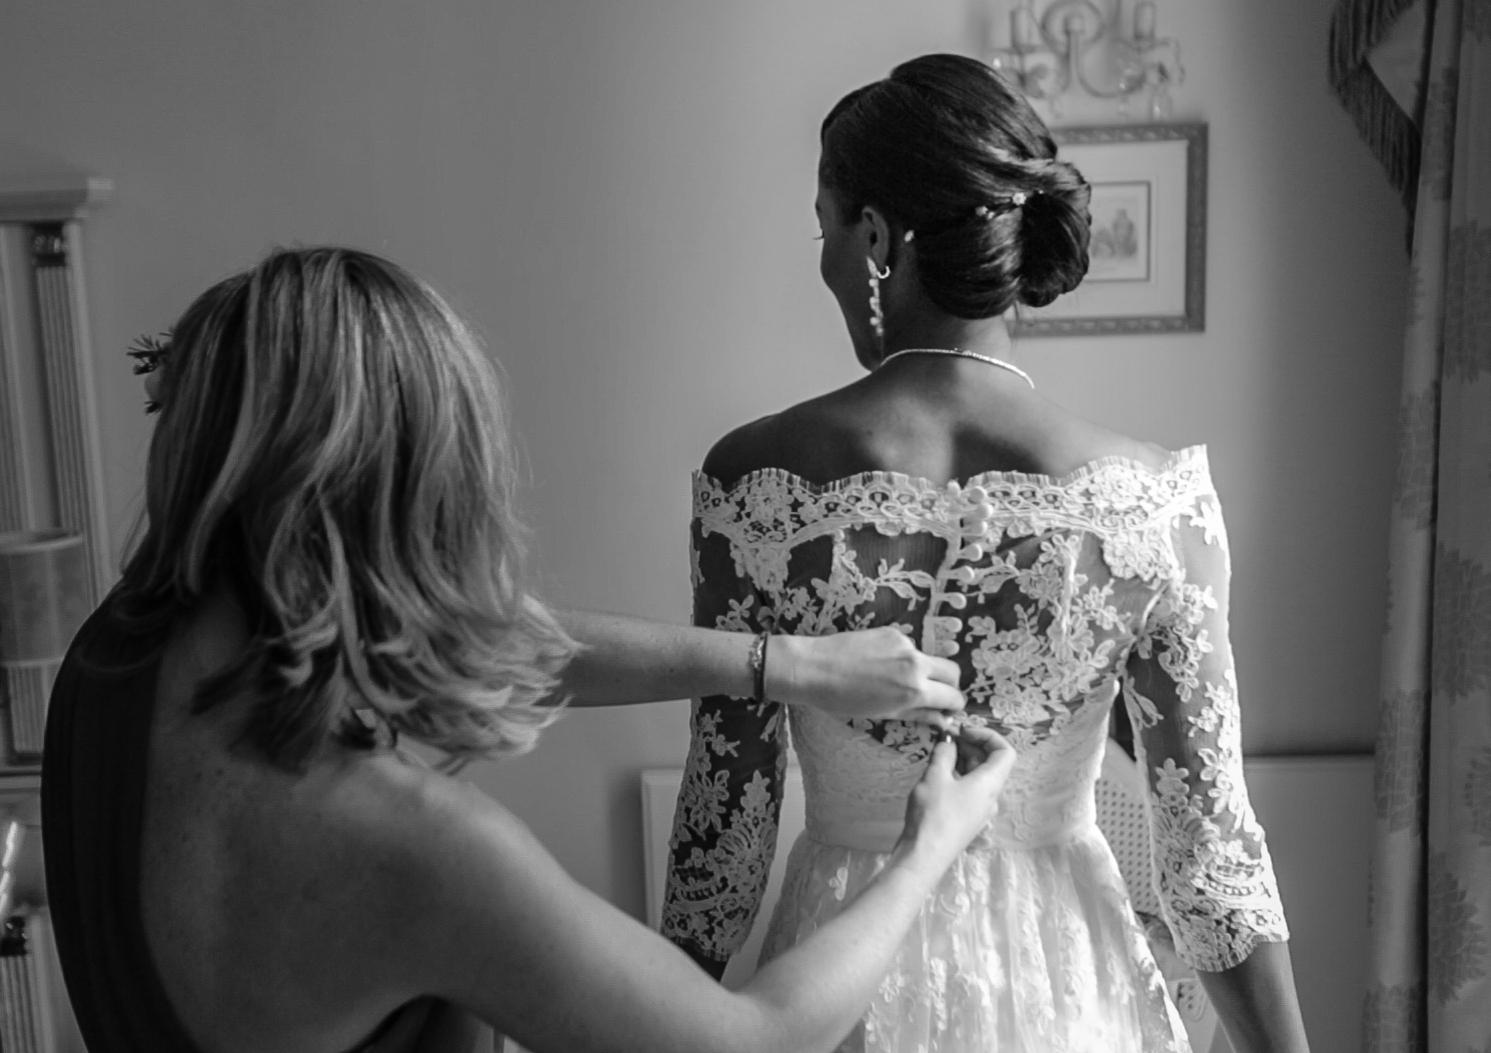 holland-park-bridal-prep-1-london-uk-destination-wedding-photography-Adam-Rowley